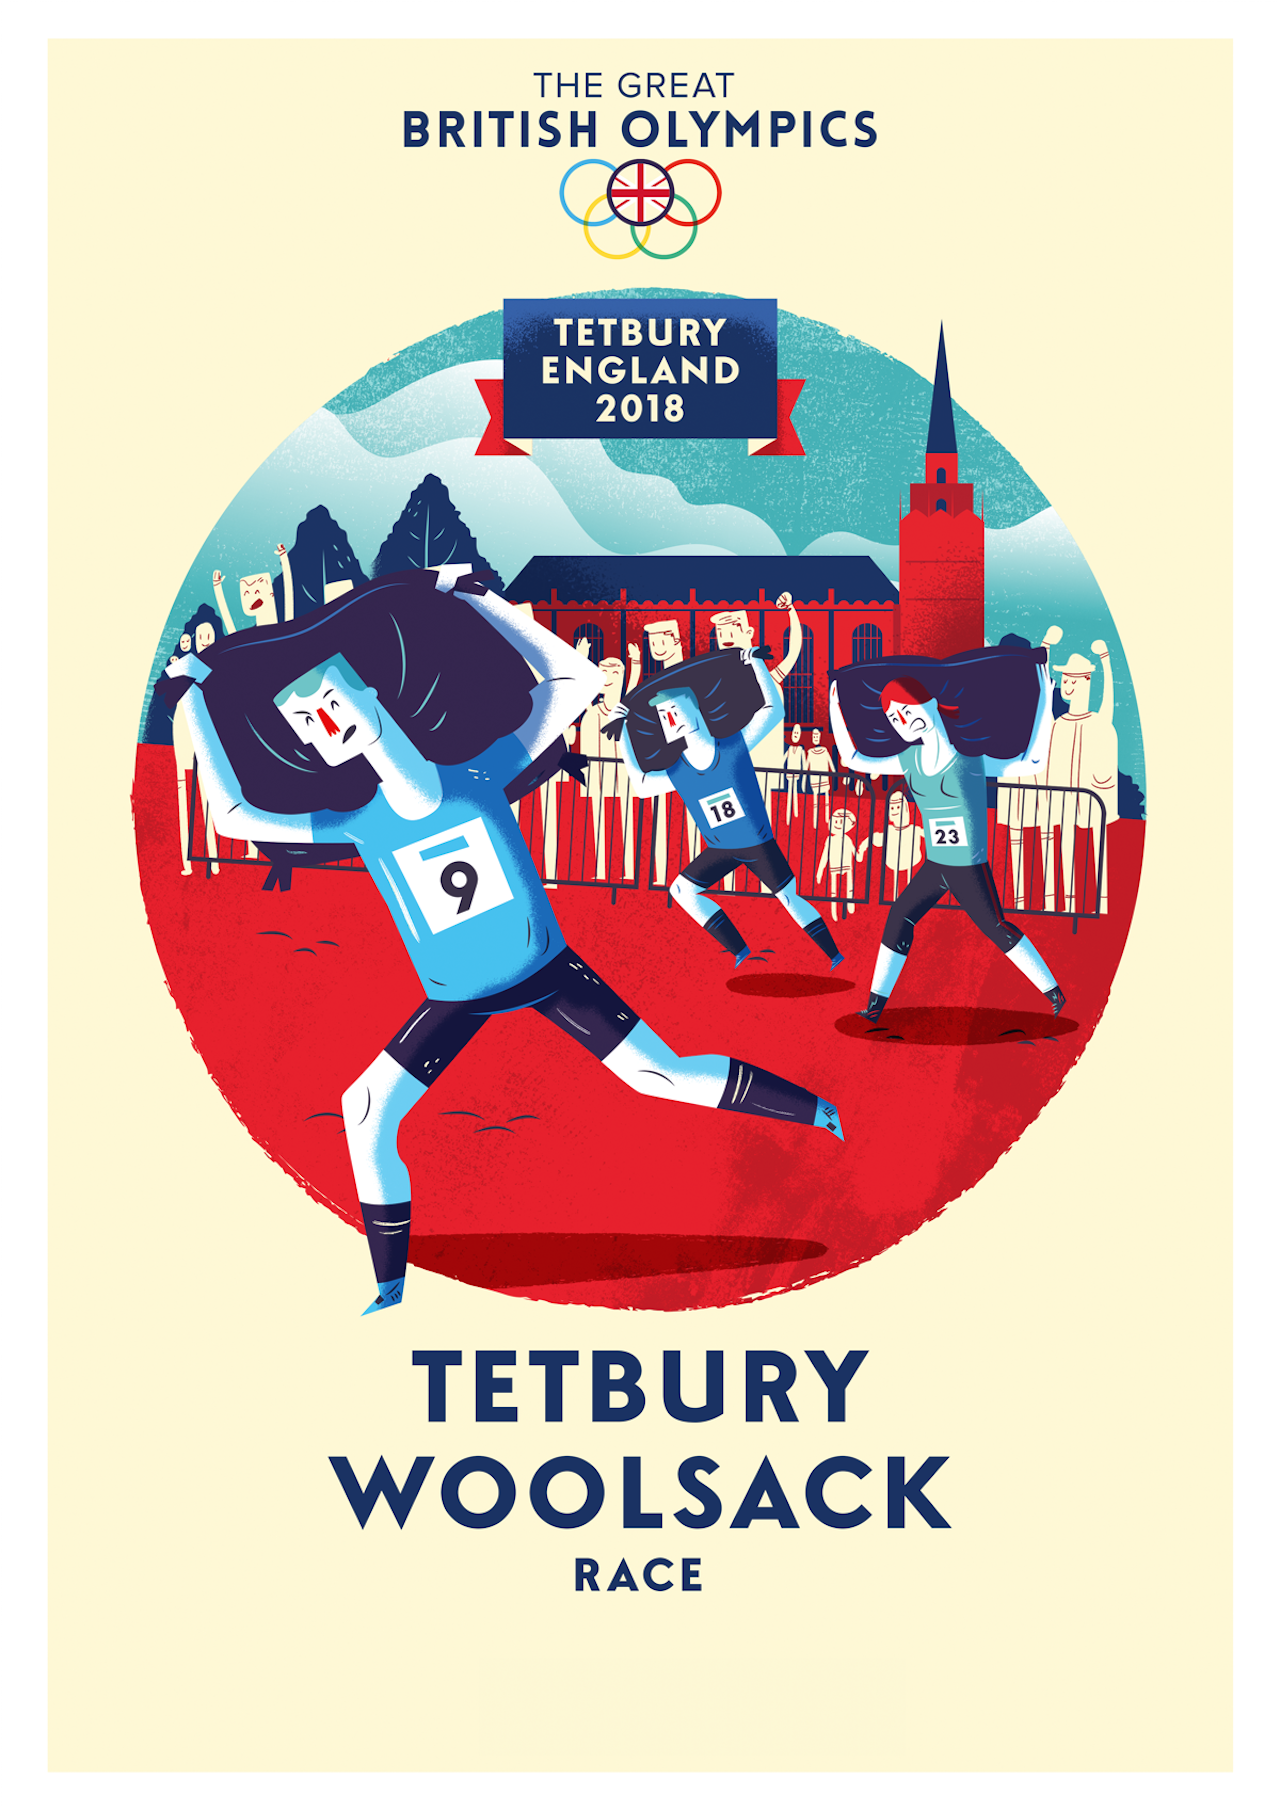 British Olympics_10 Tetbury Woolsack